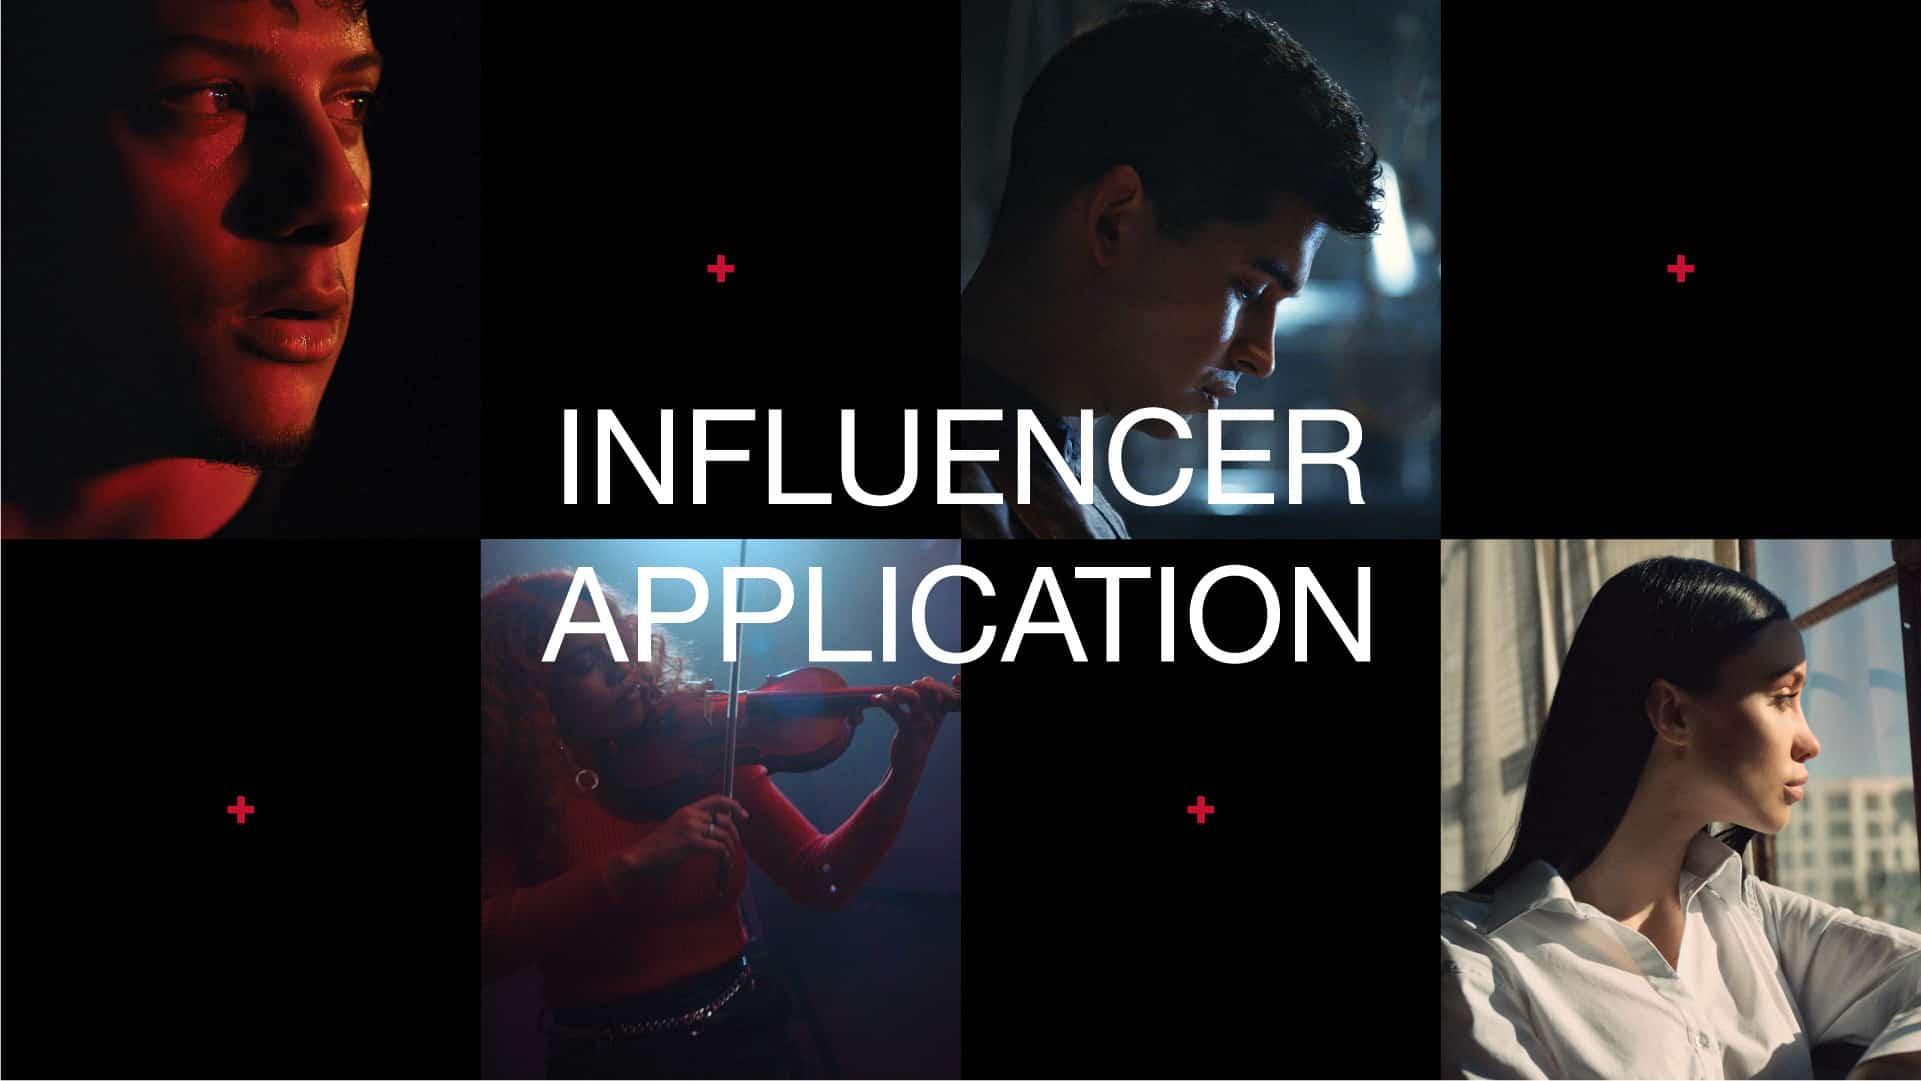 Influencer Application